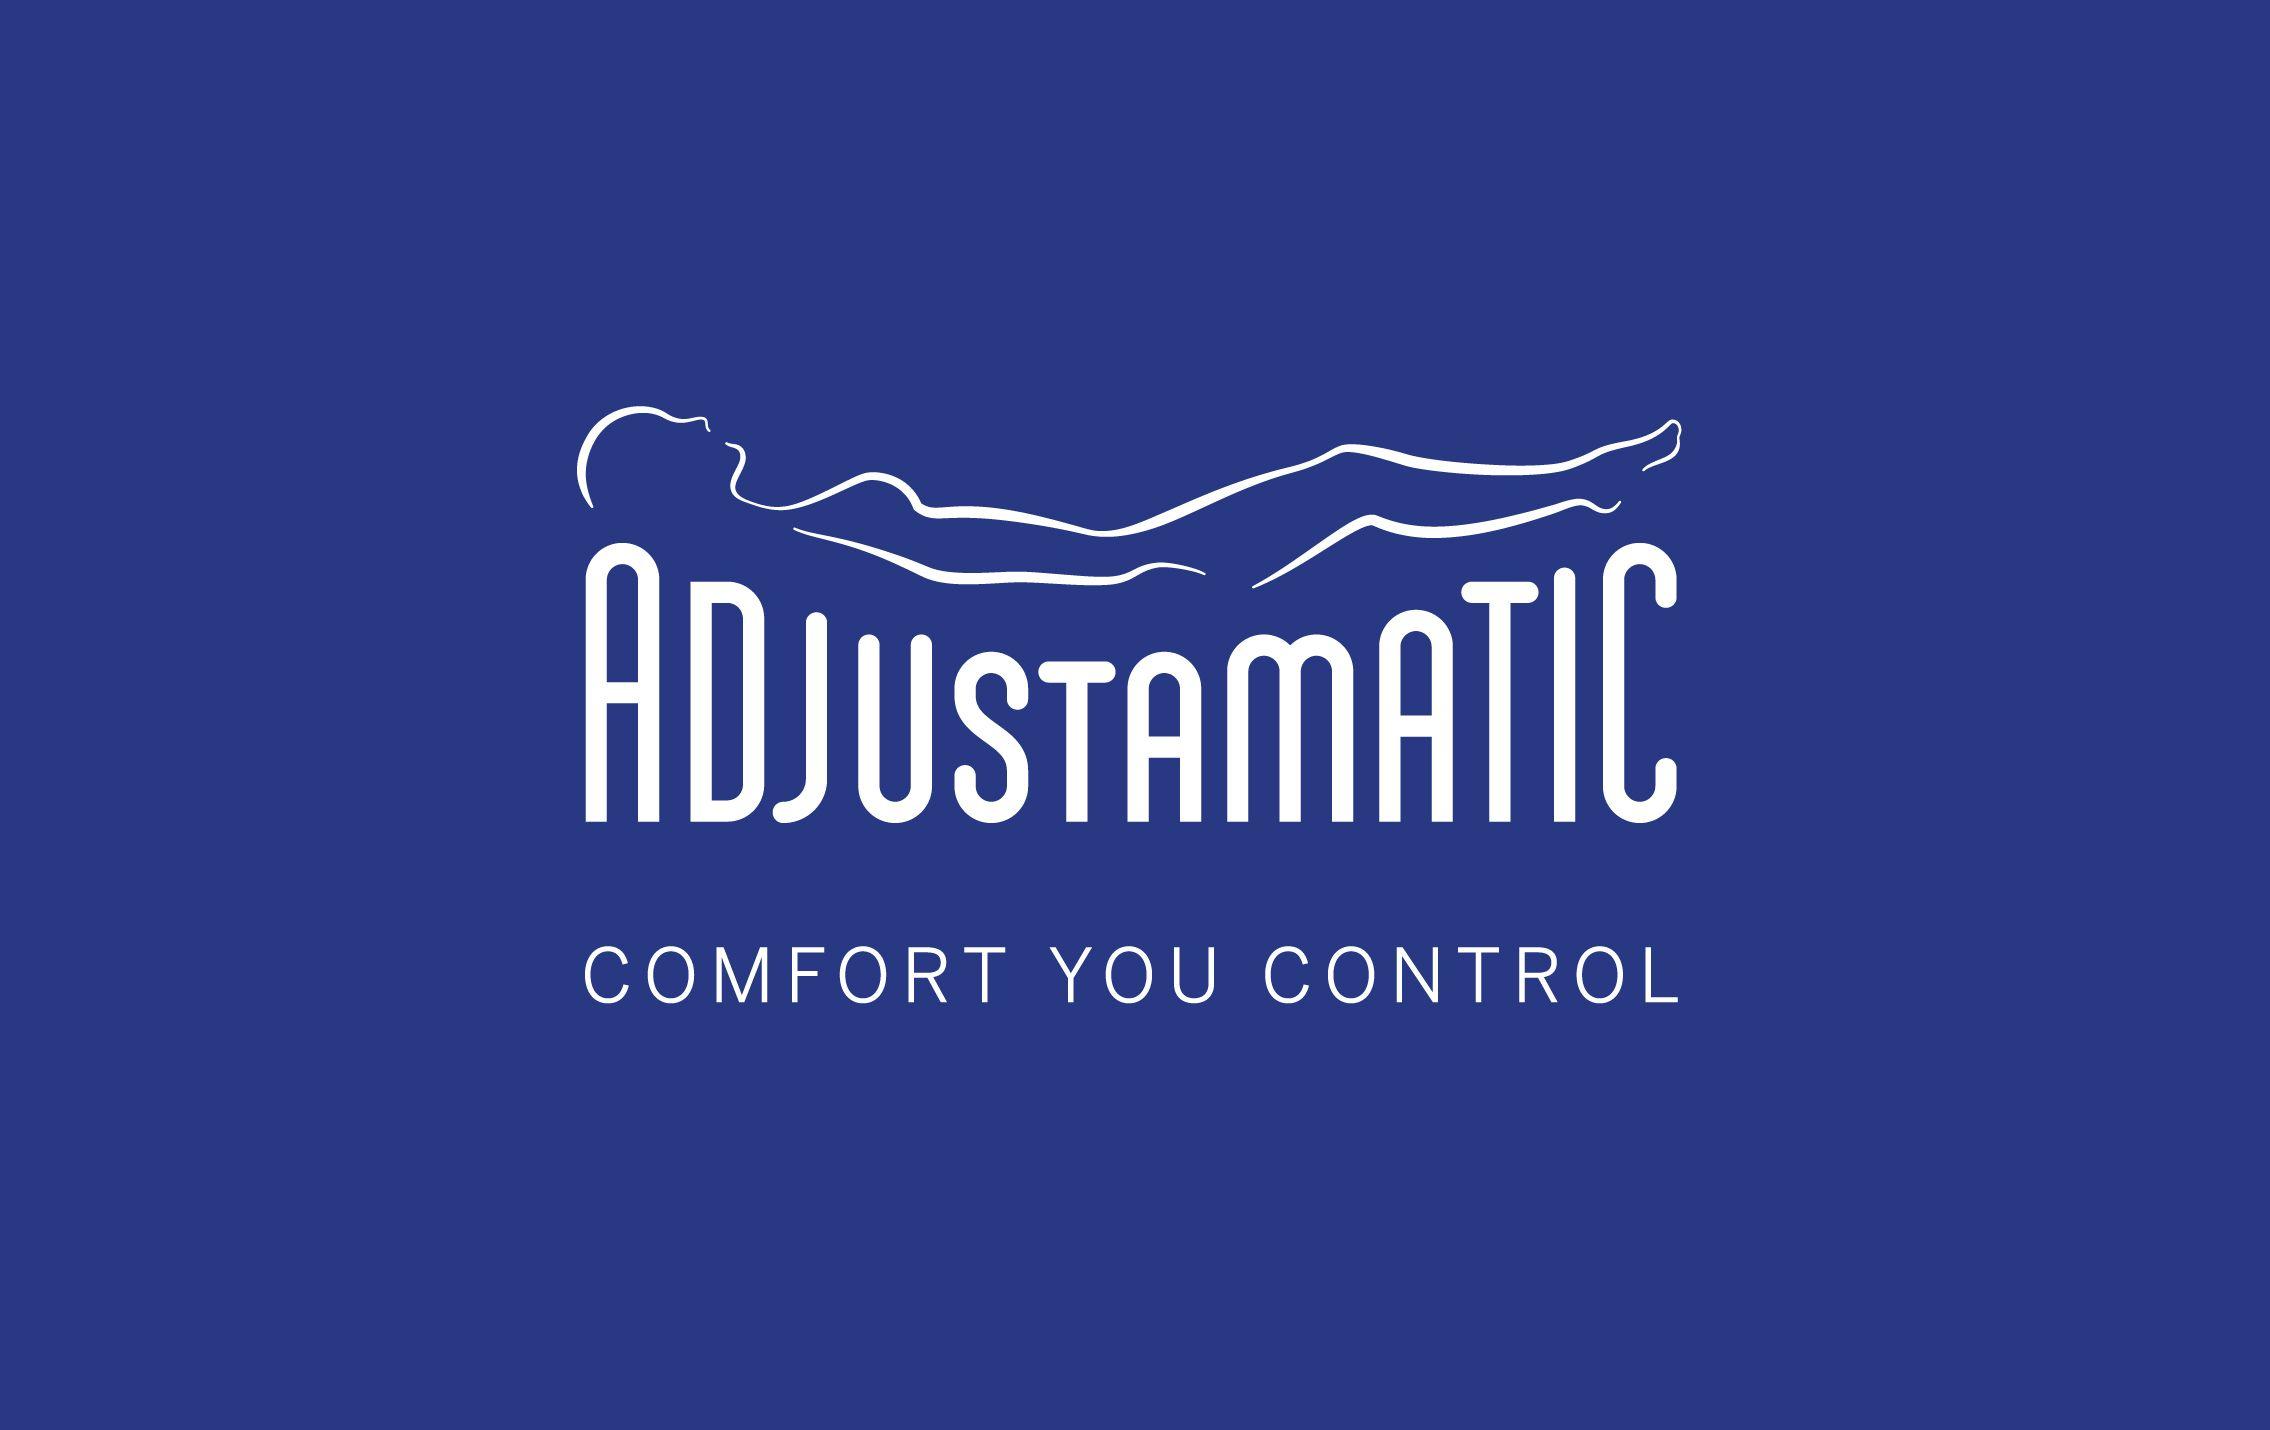 Adjustamatic Beds Ltd